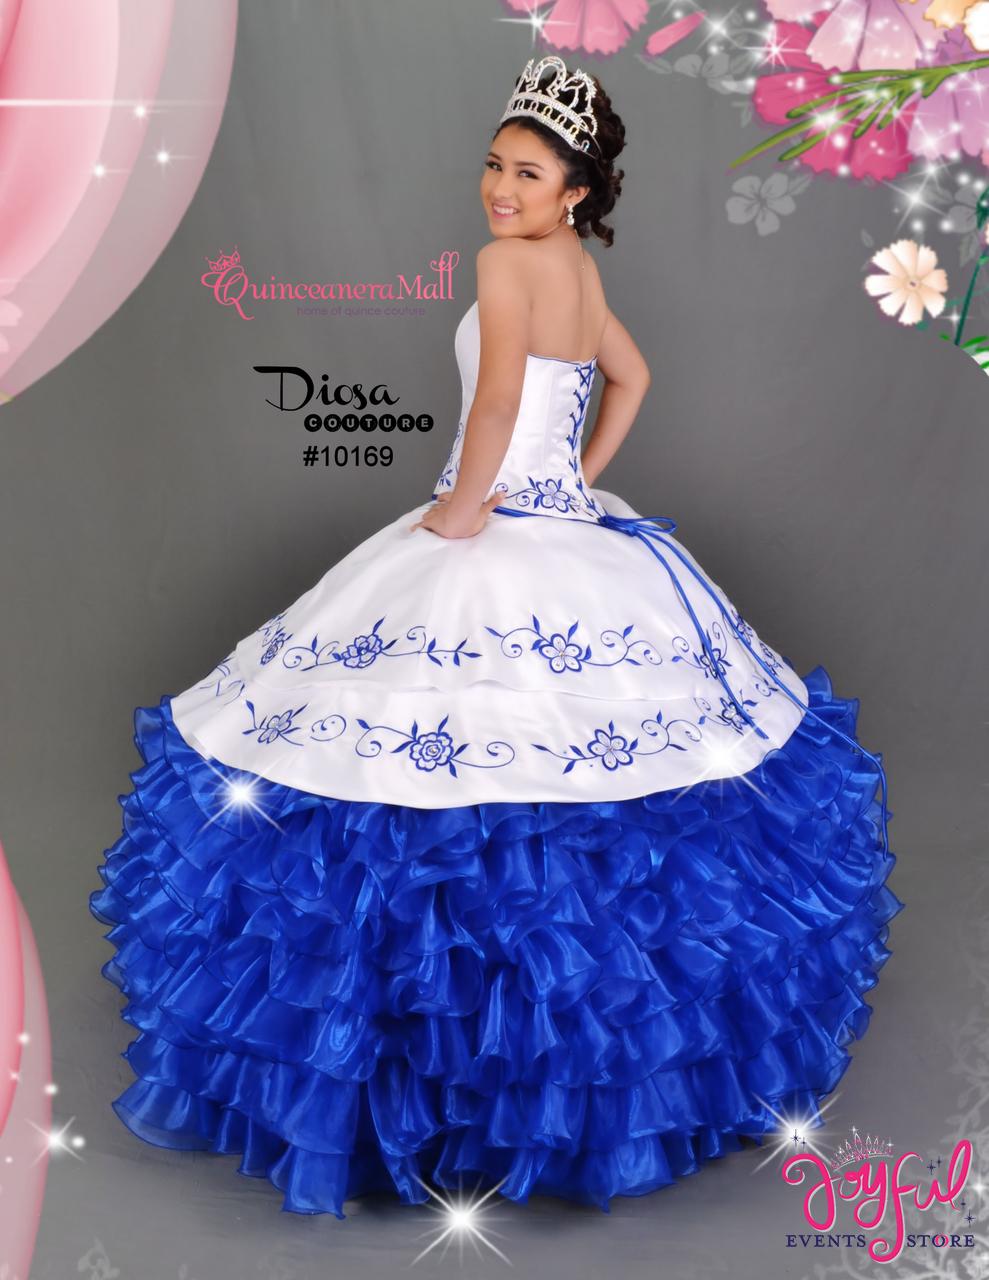 58a19dff64f Charra Quinceanera Dress  10169JES · Charra Quinceanera Dress  10169JES ...